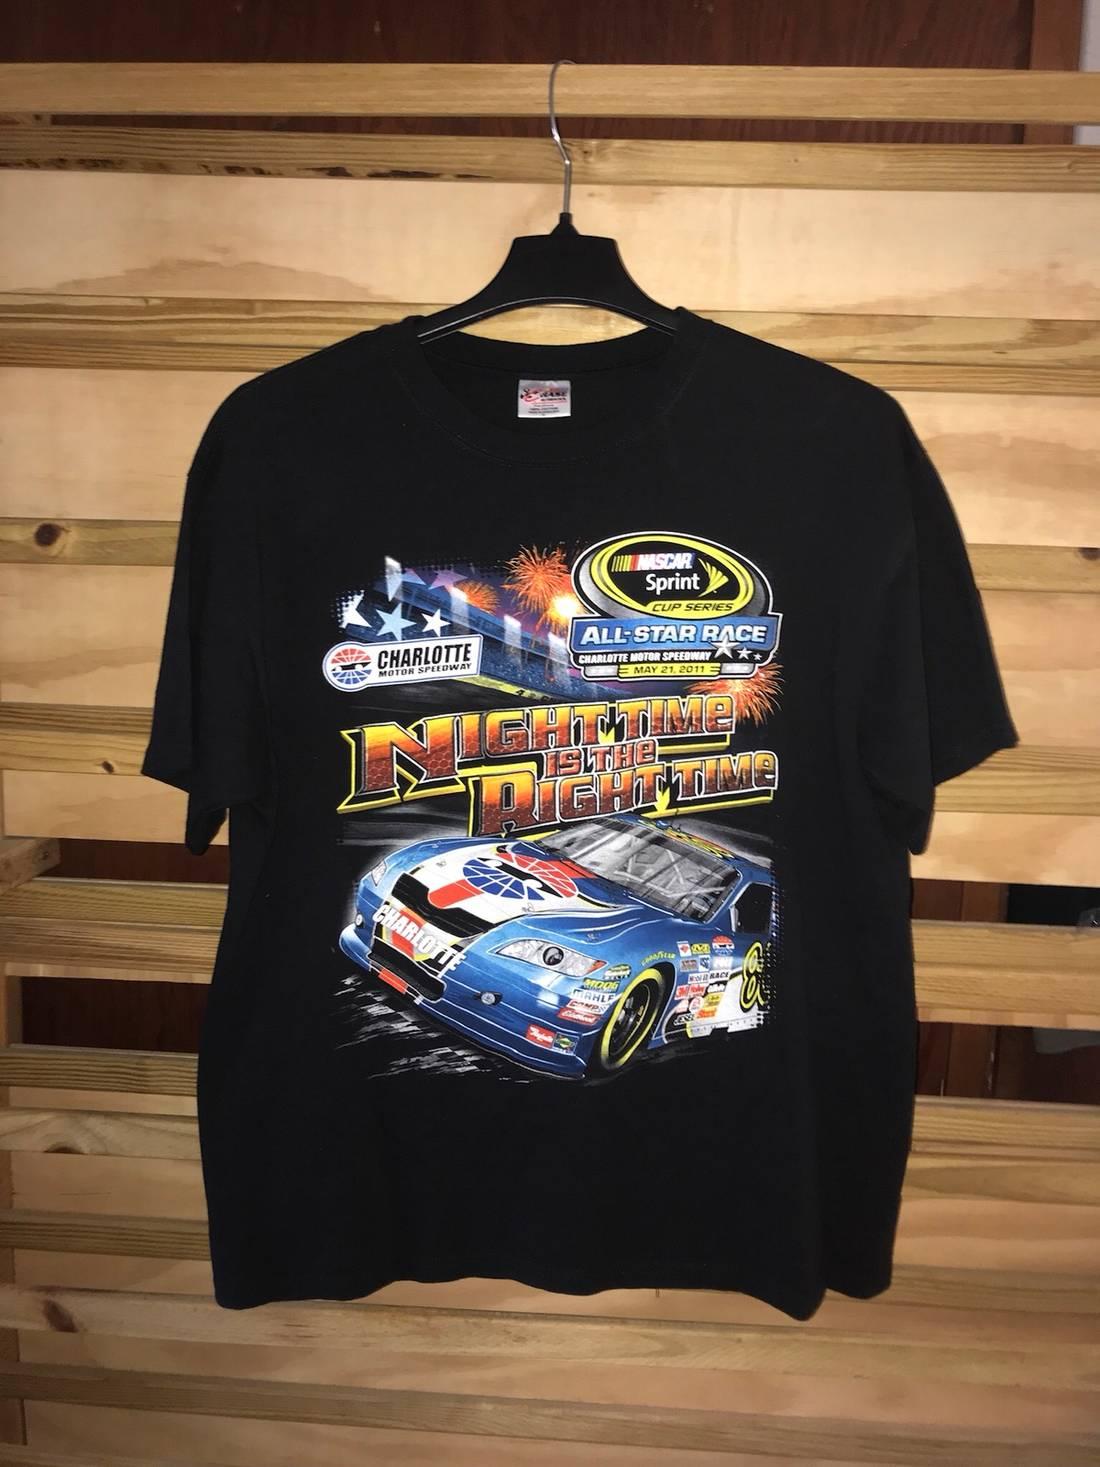 Stock Car Racing T Shirt Designs   AGBU Hye Geen